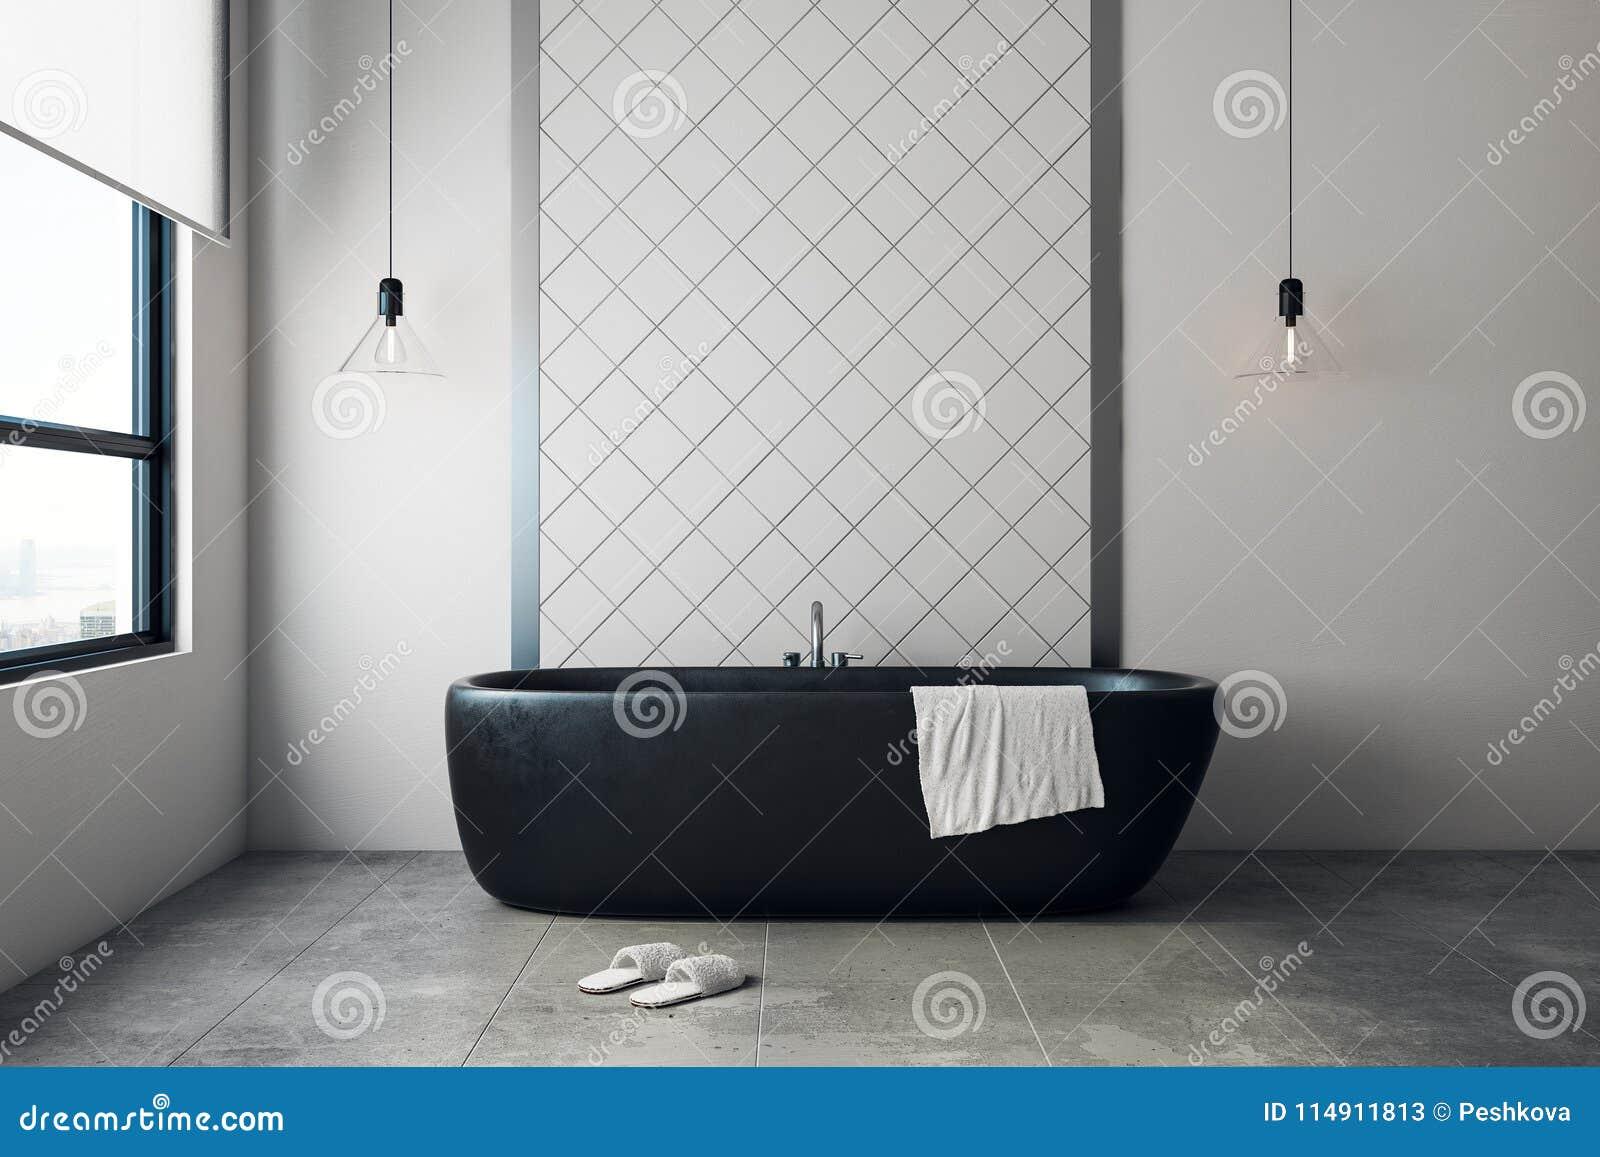 New Bathroom With Copyspace Stock Illustration - Illustration of ...